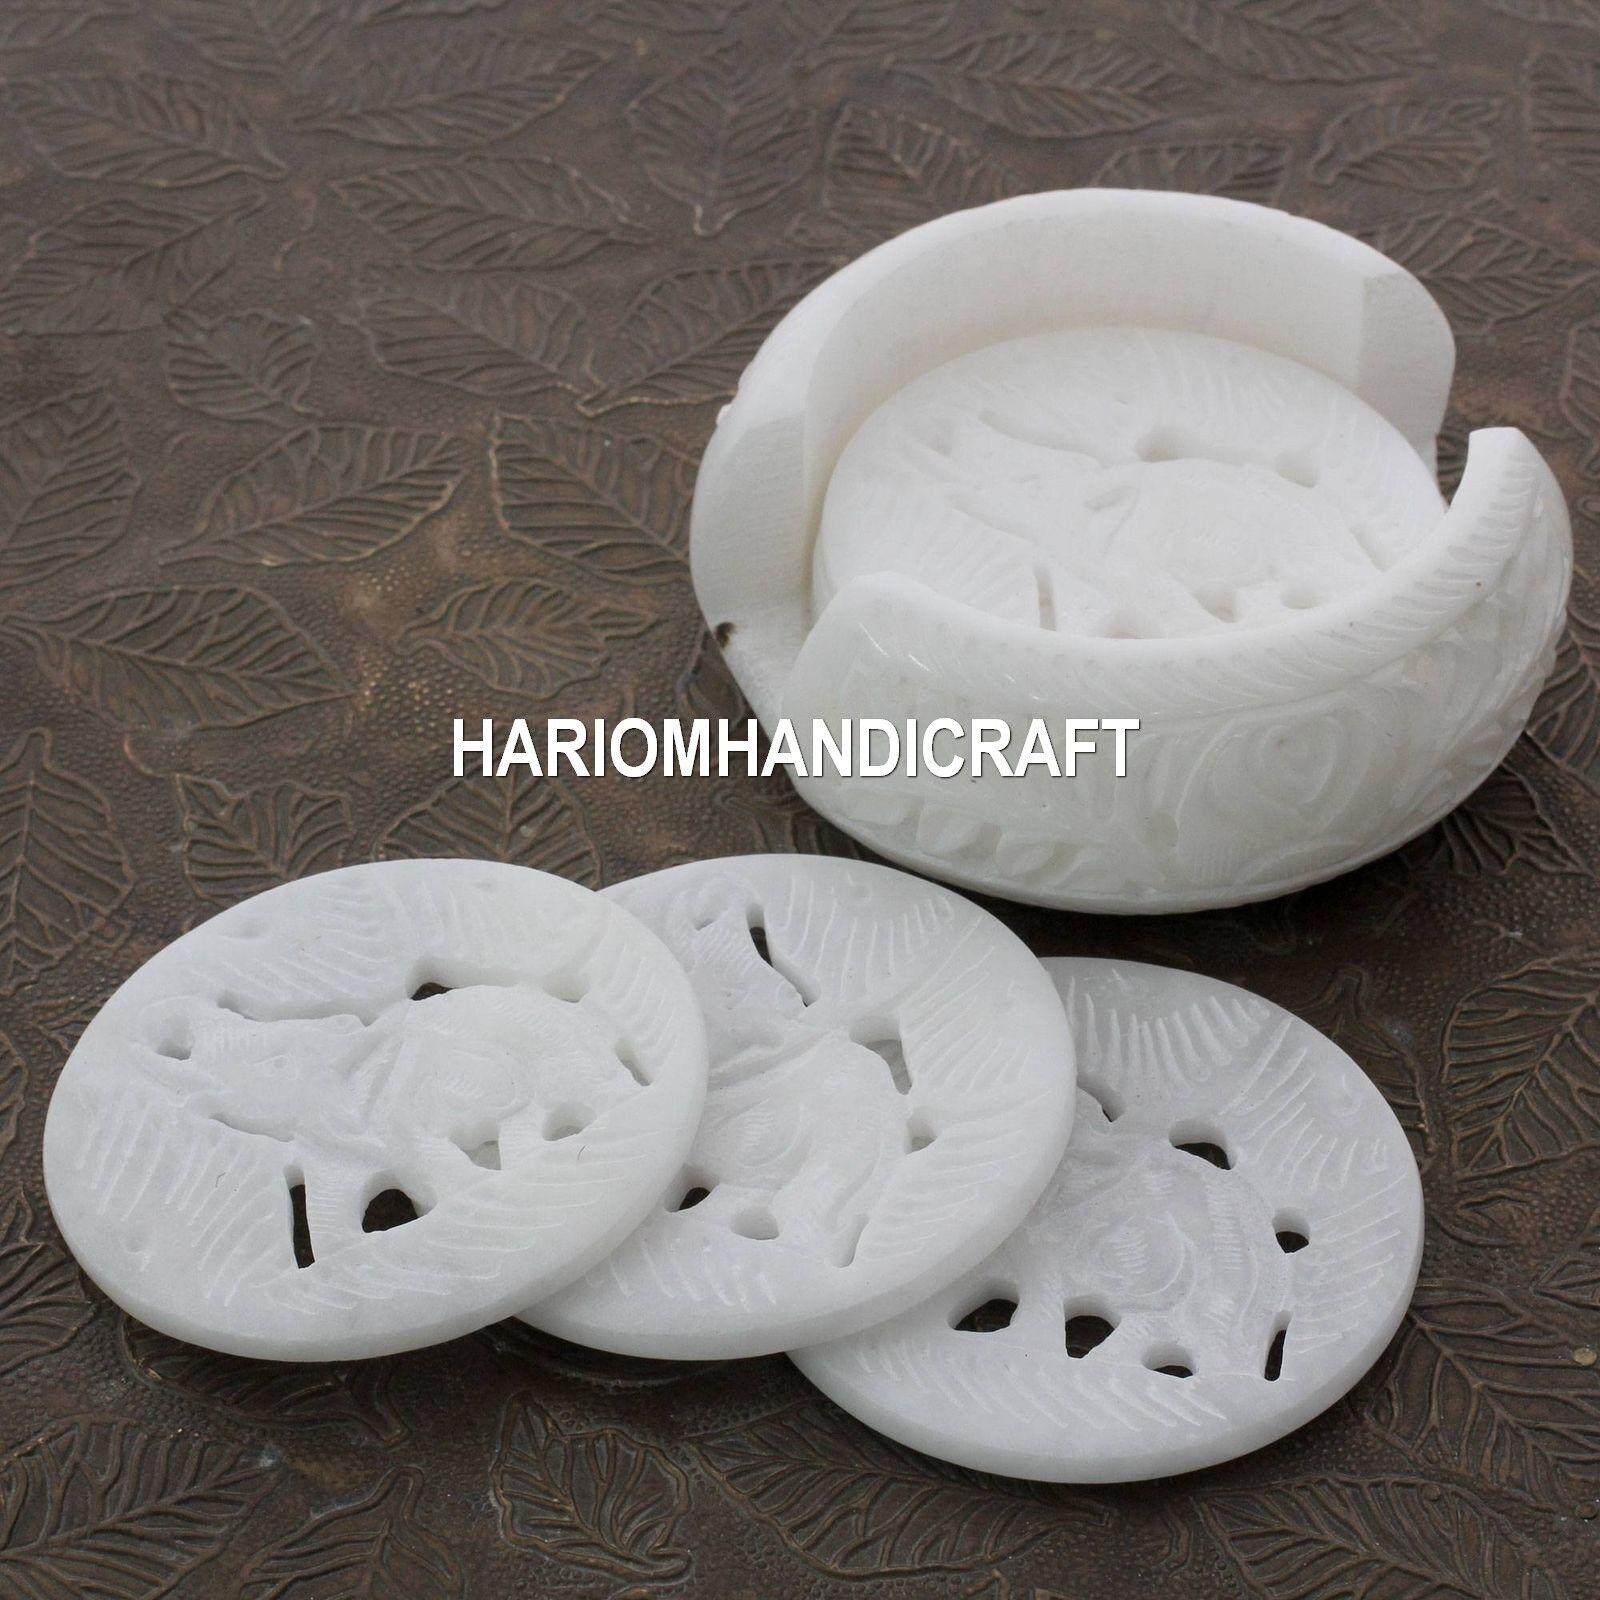 6pcs Marble Round Elephant Coaster Set handmade office Table Elephant Art Gifts